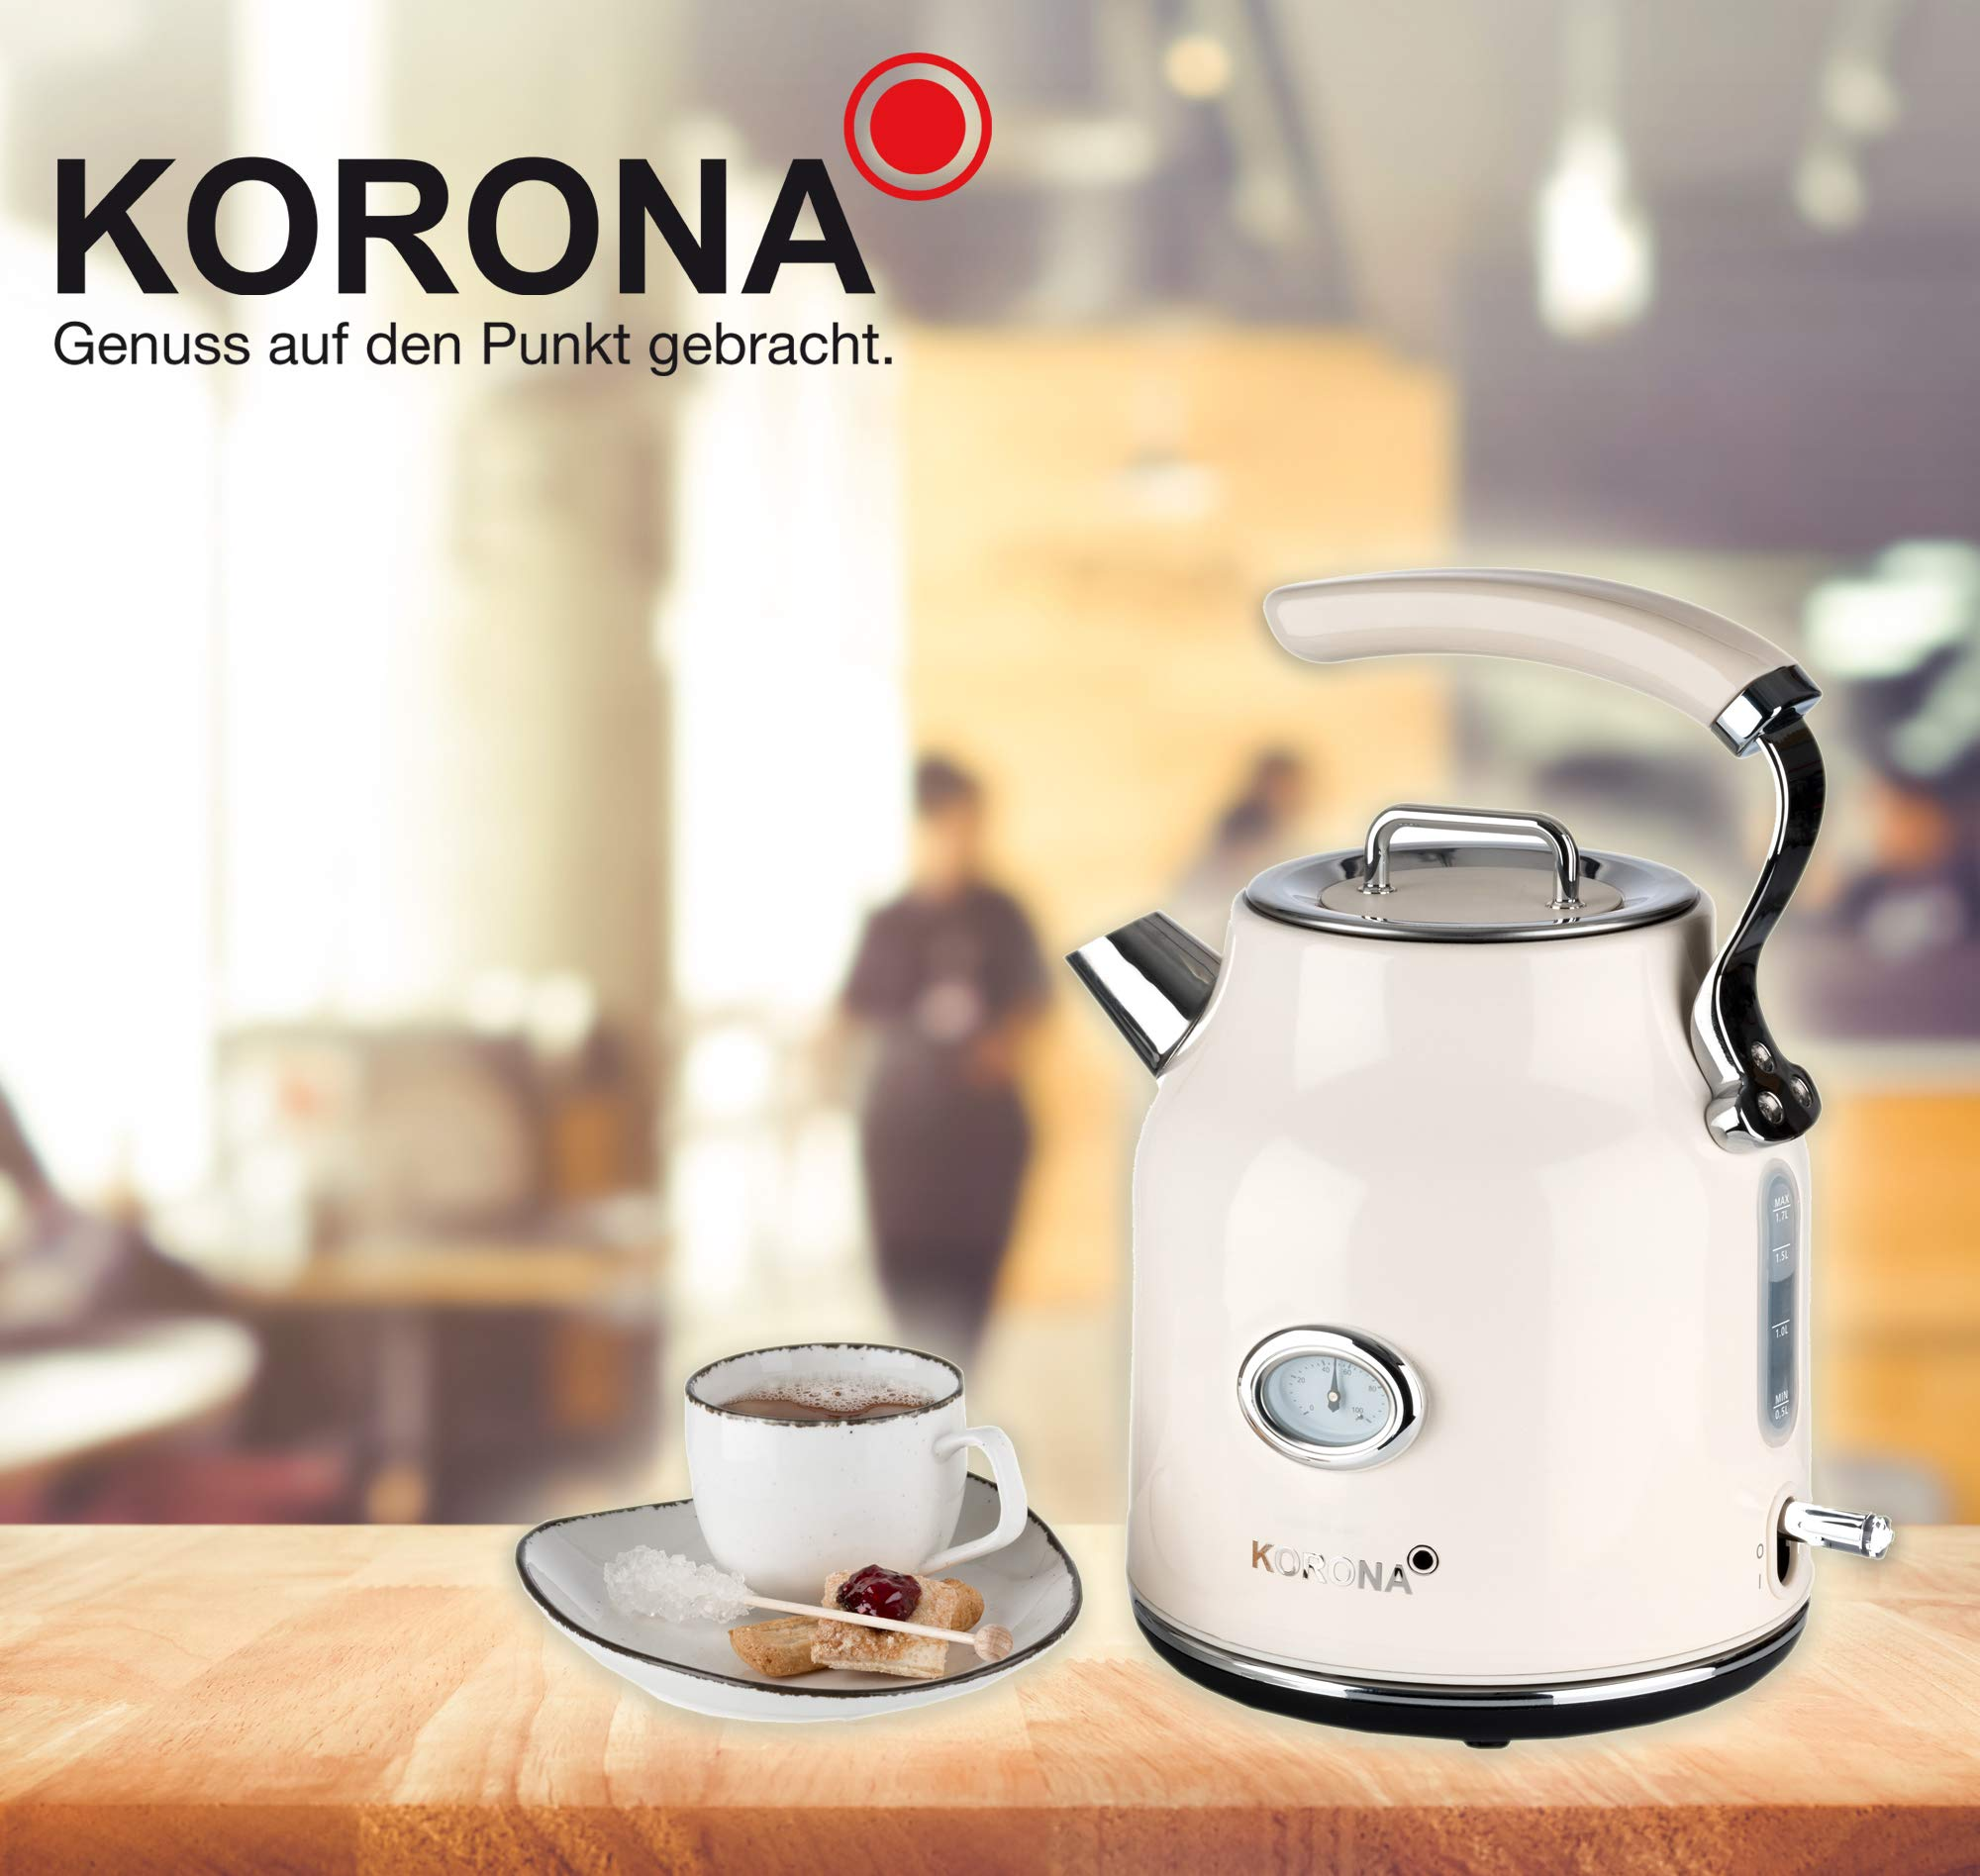 Korona-Retro-Wasserkocher